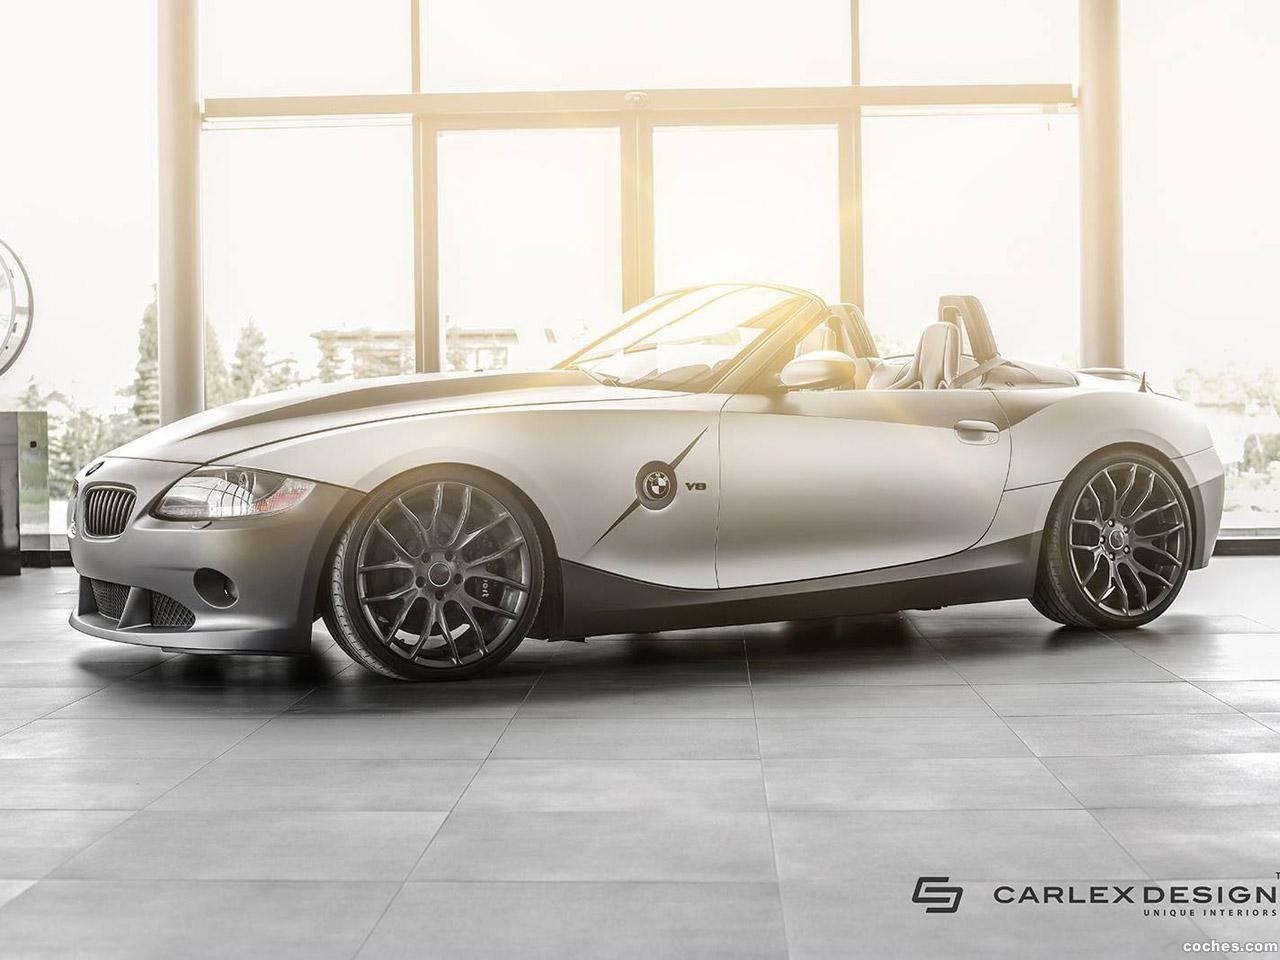 Foto 0 de BMW Z4 Carlex Design 2015